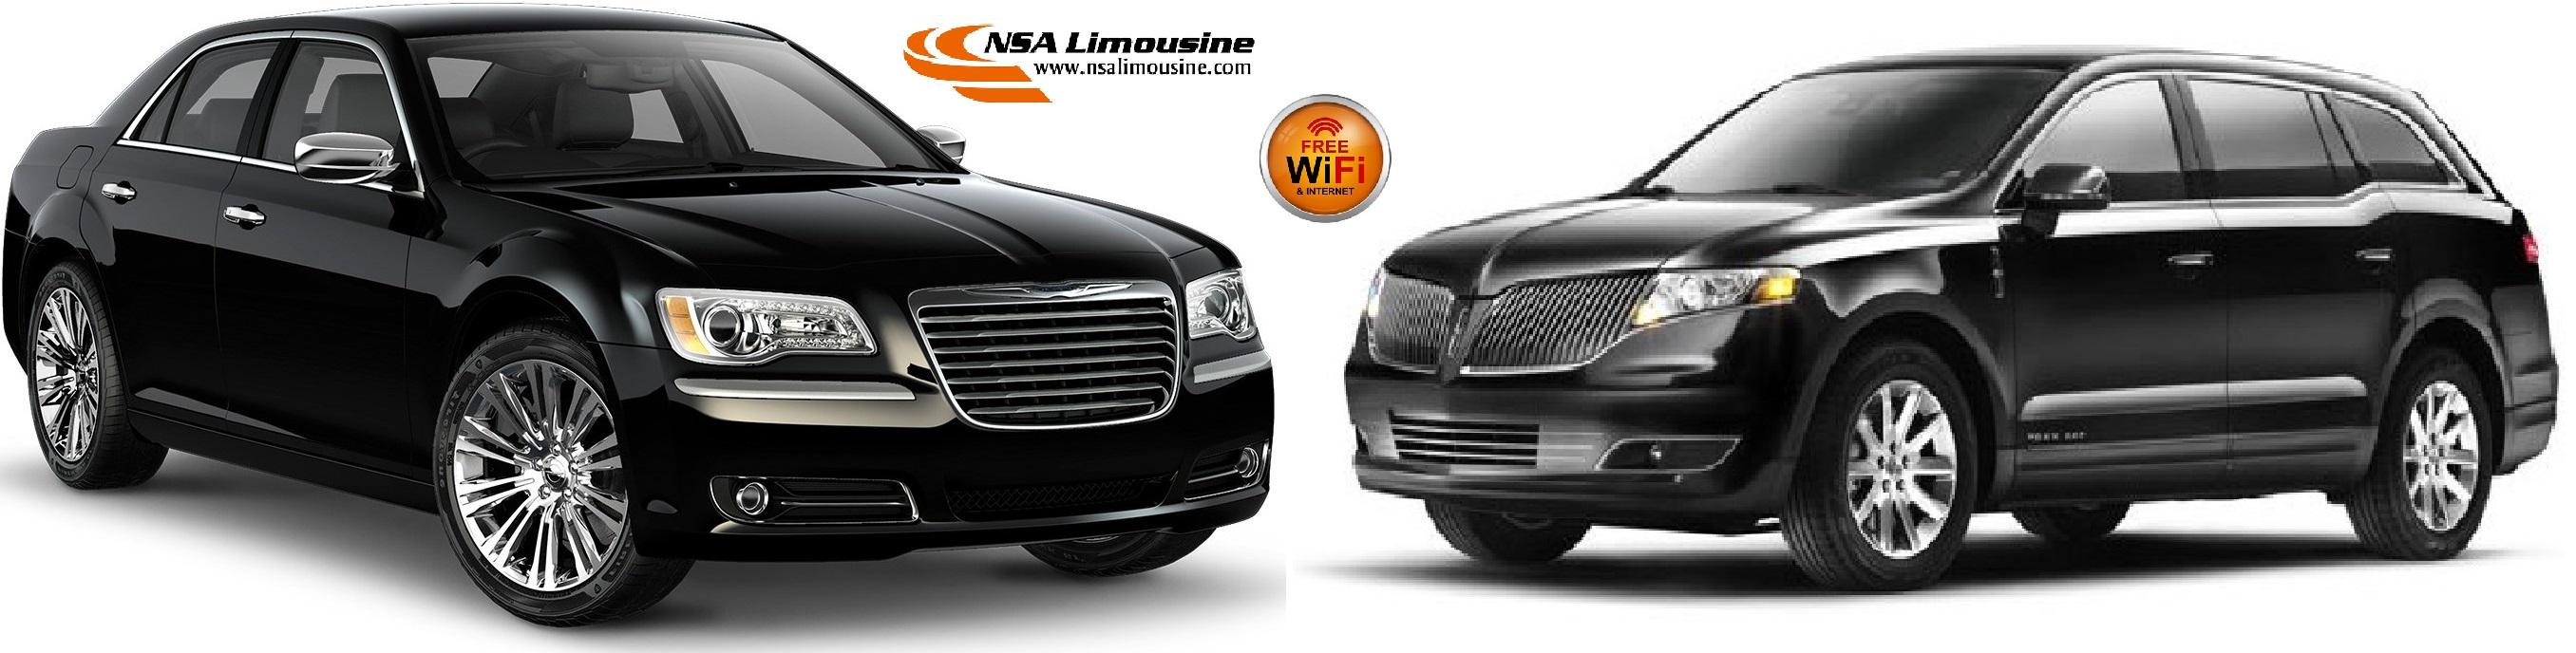 NSA Limousine